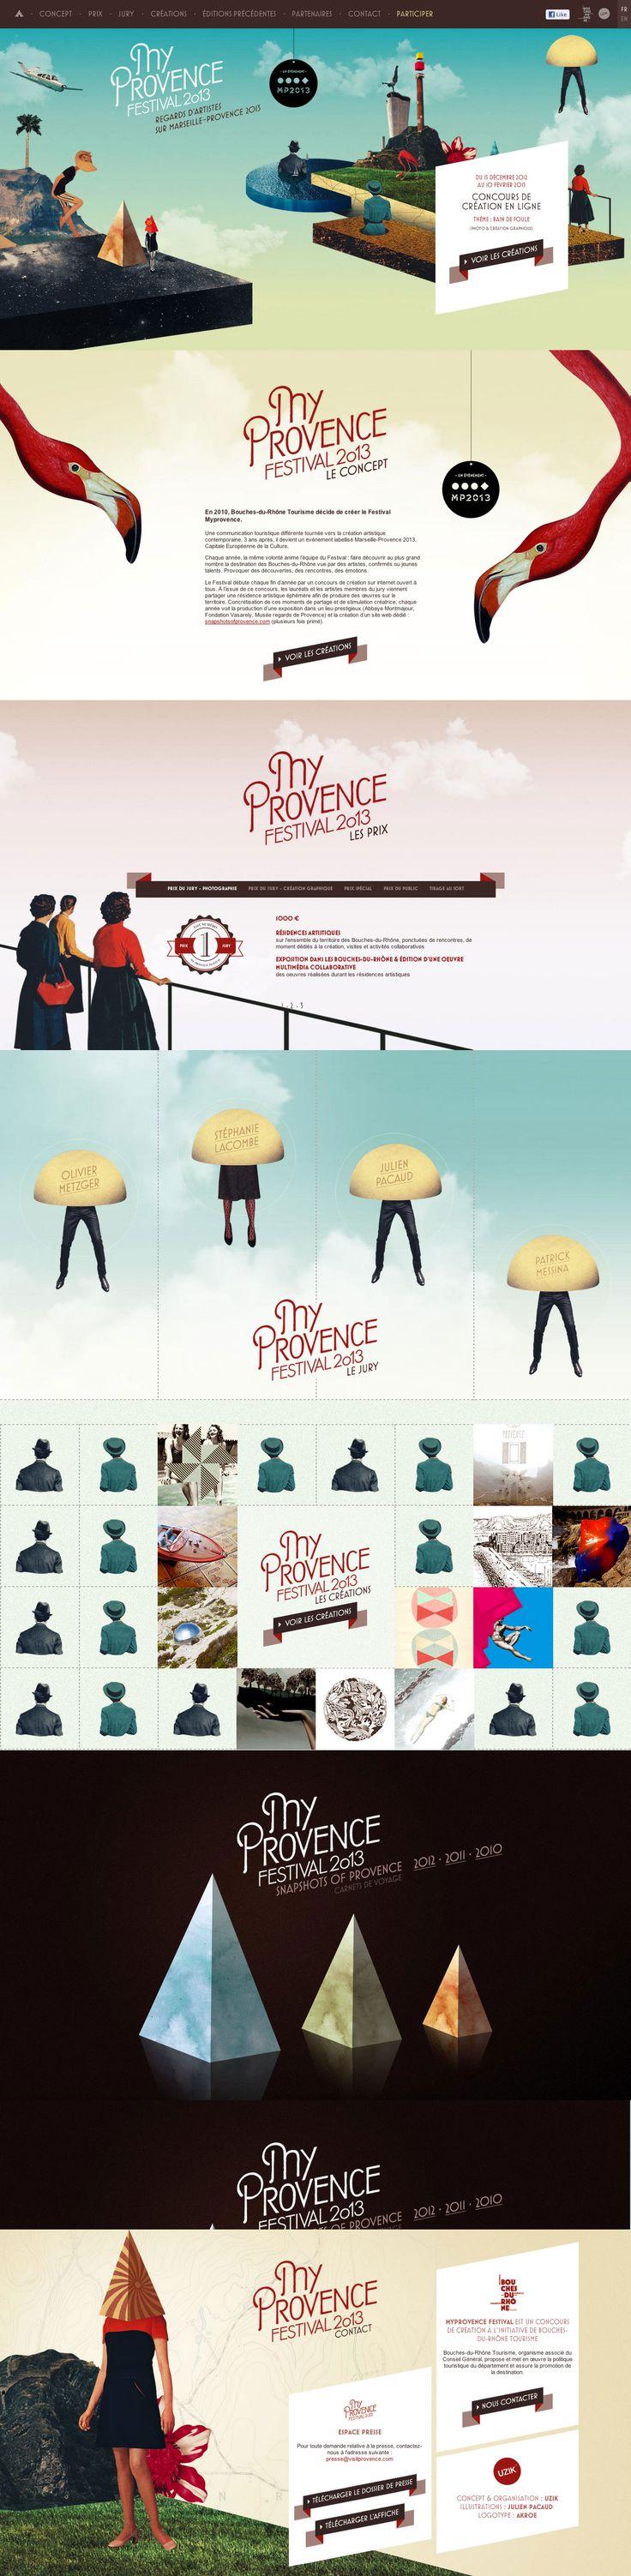 http://www.myprovence.fr/